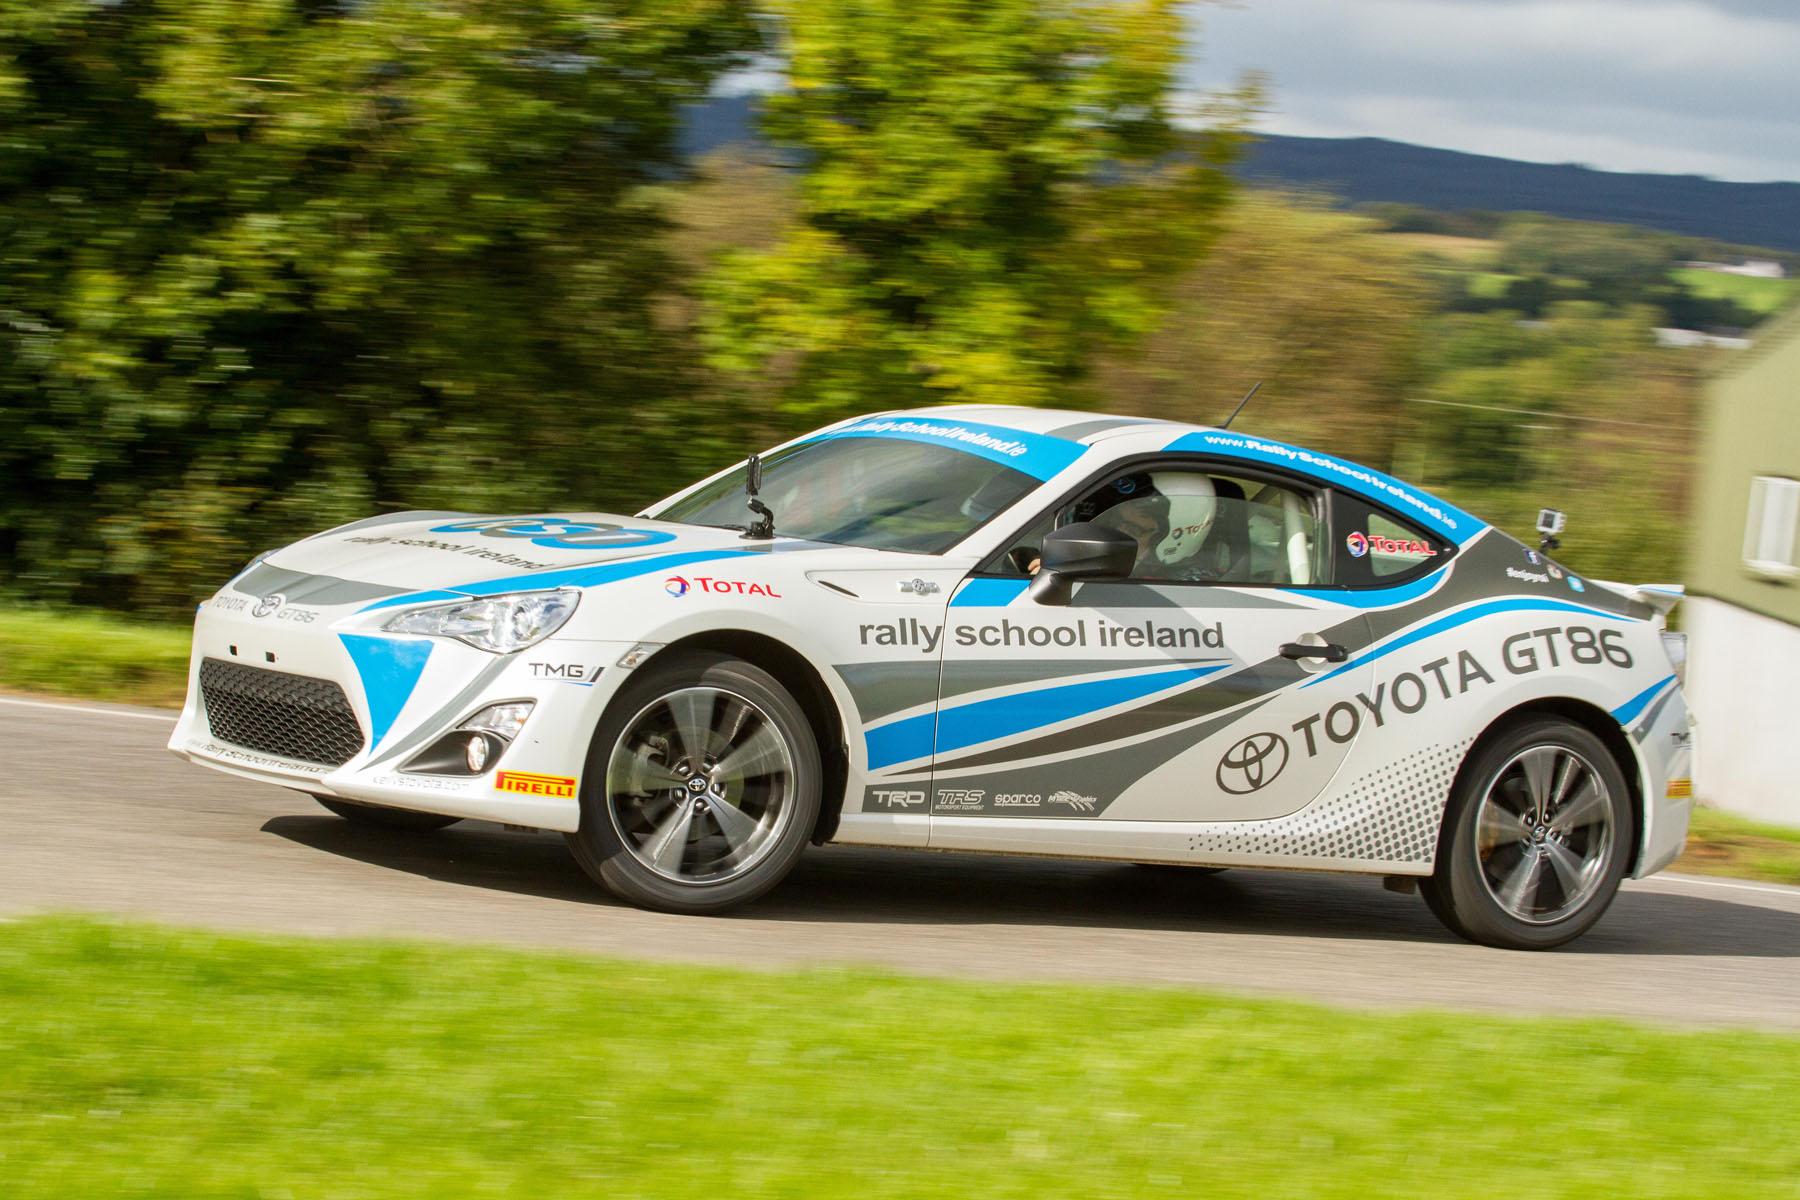 Toyota Rally School Ireland